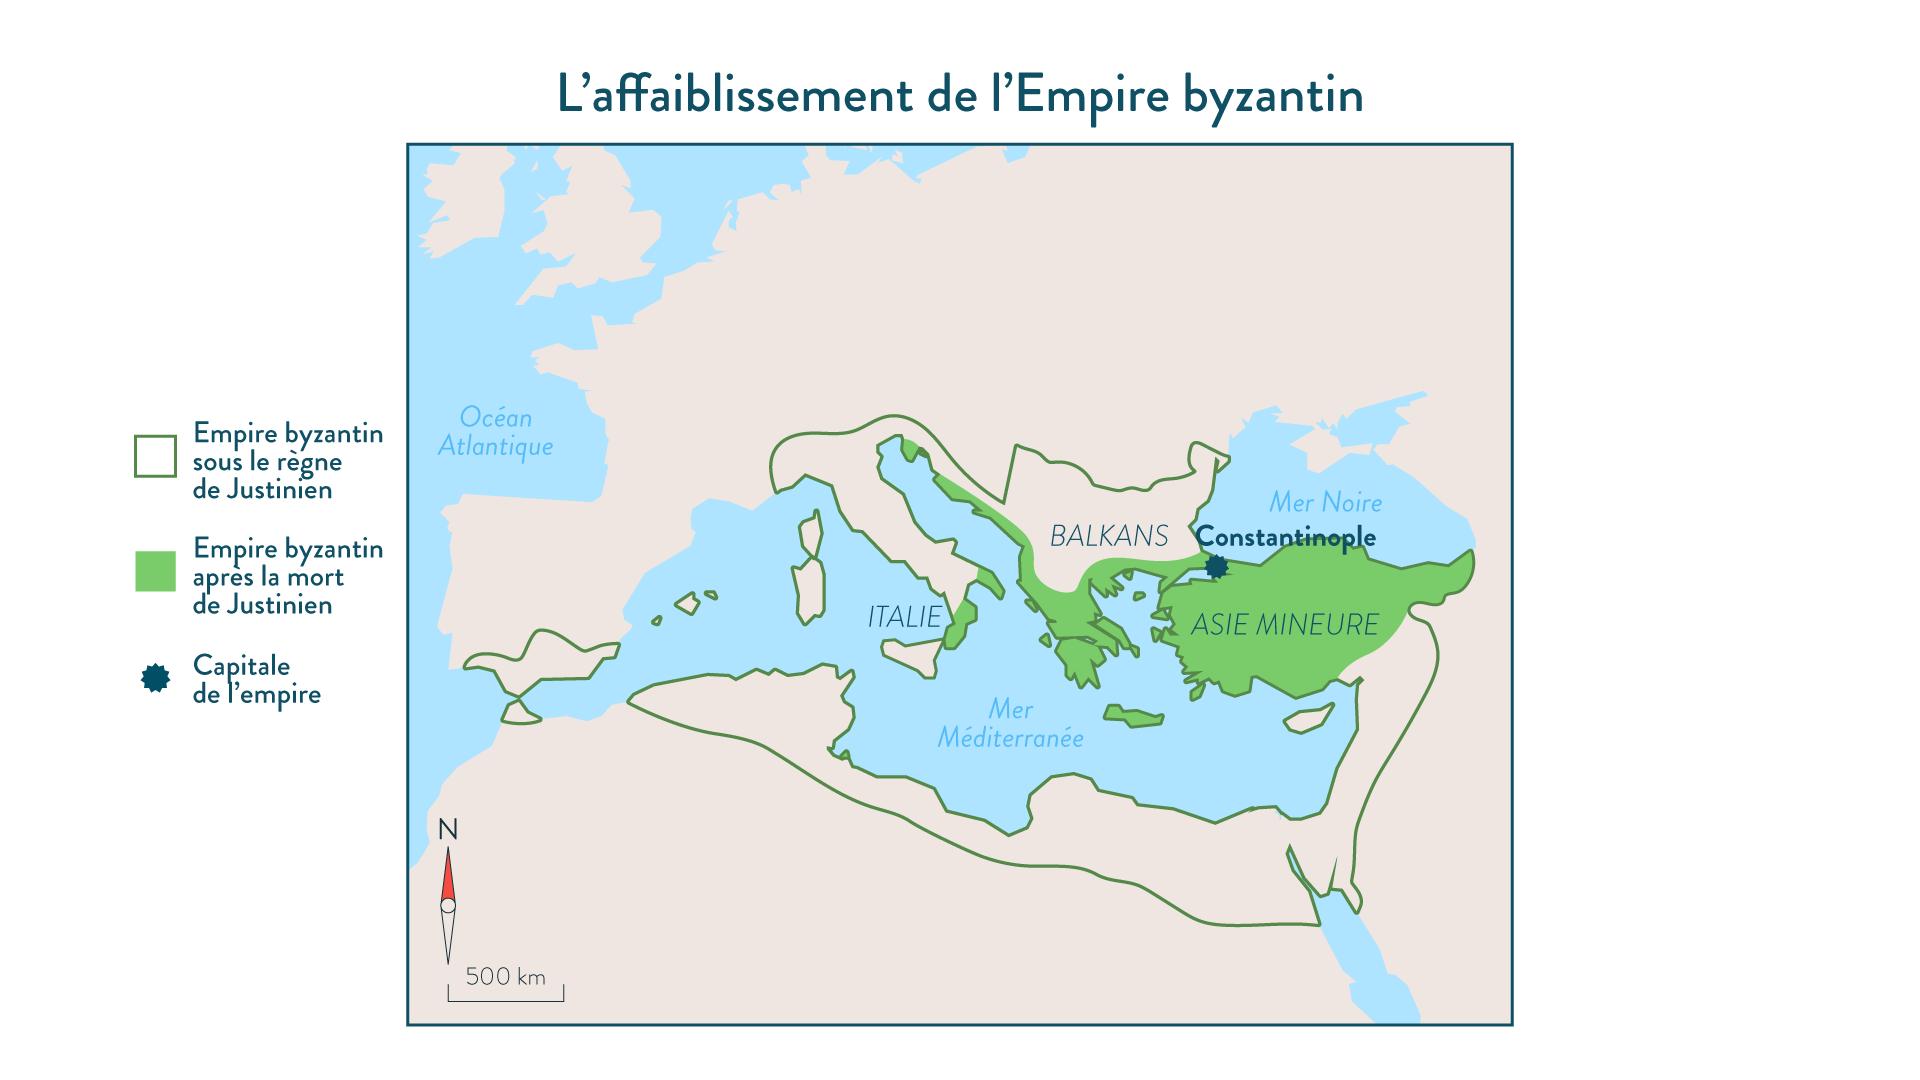 L'affaiblissement de l'Empire byzantin - 5e - Histoire